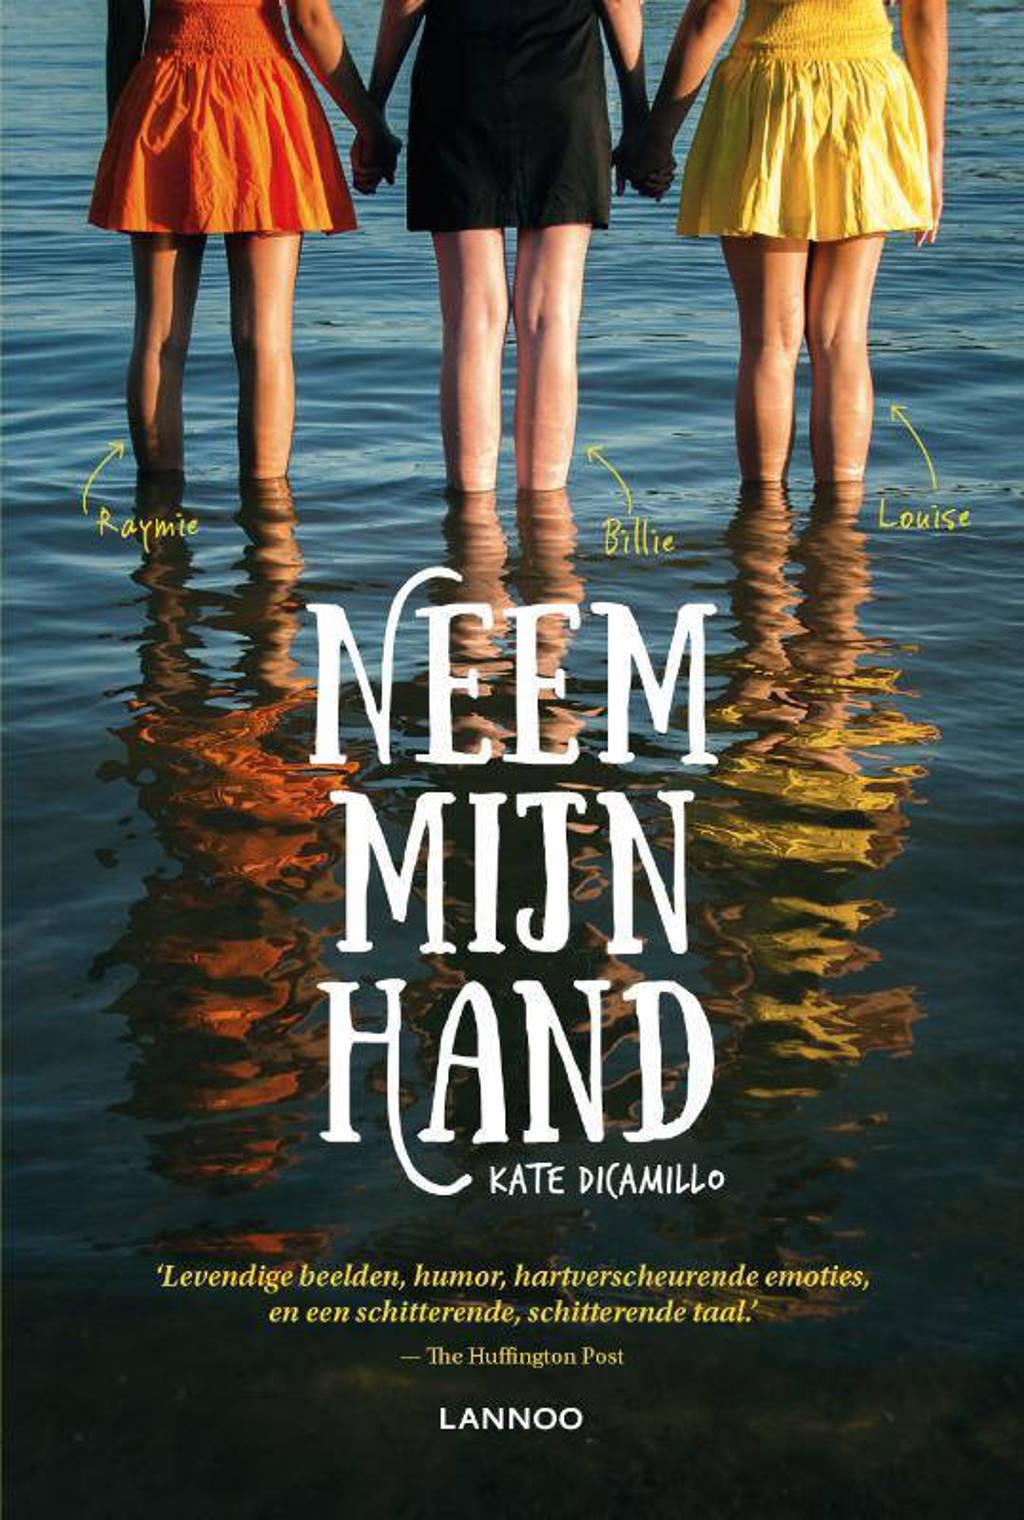 Neem mijn hand - Kate DiCamillo